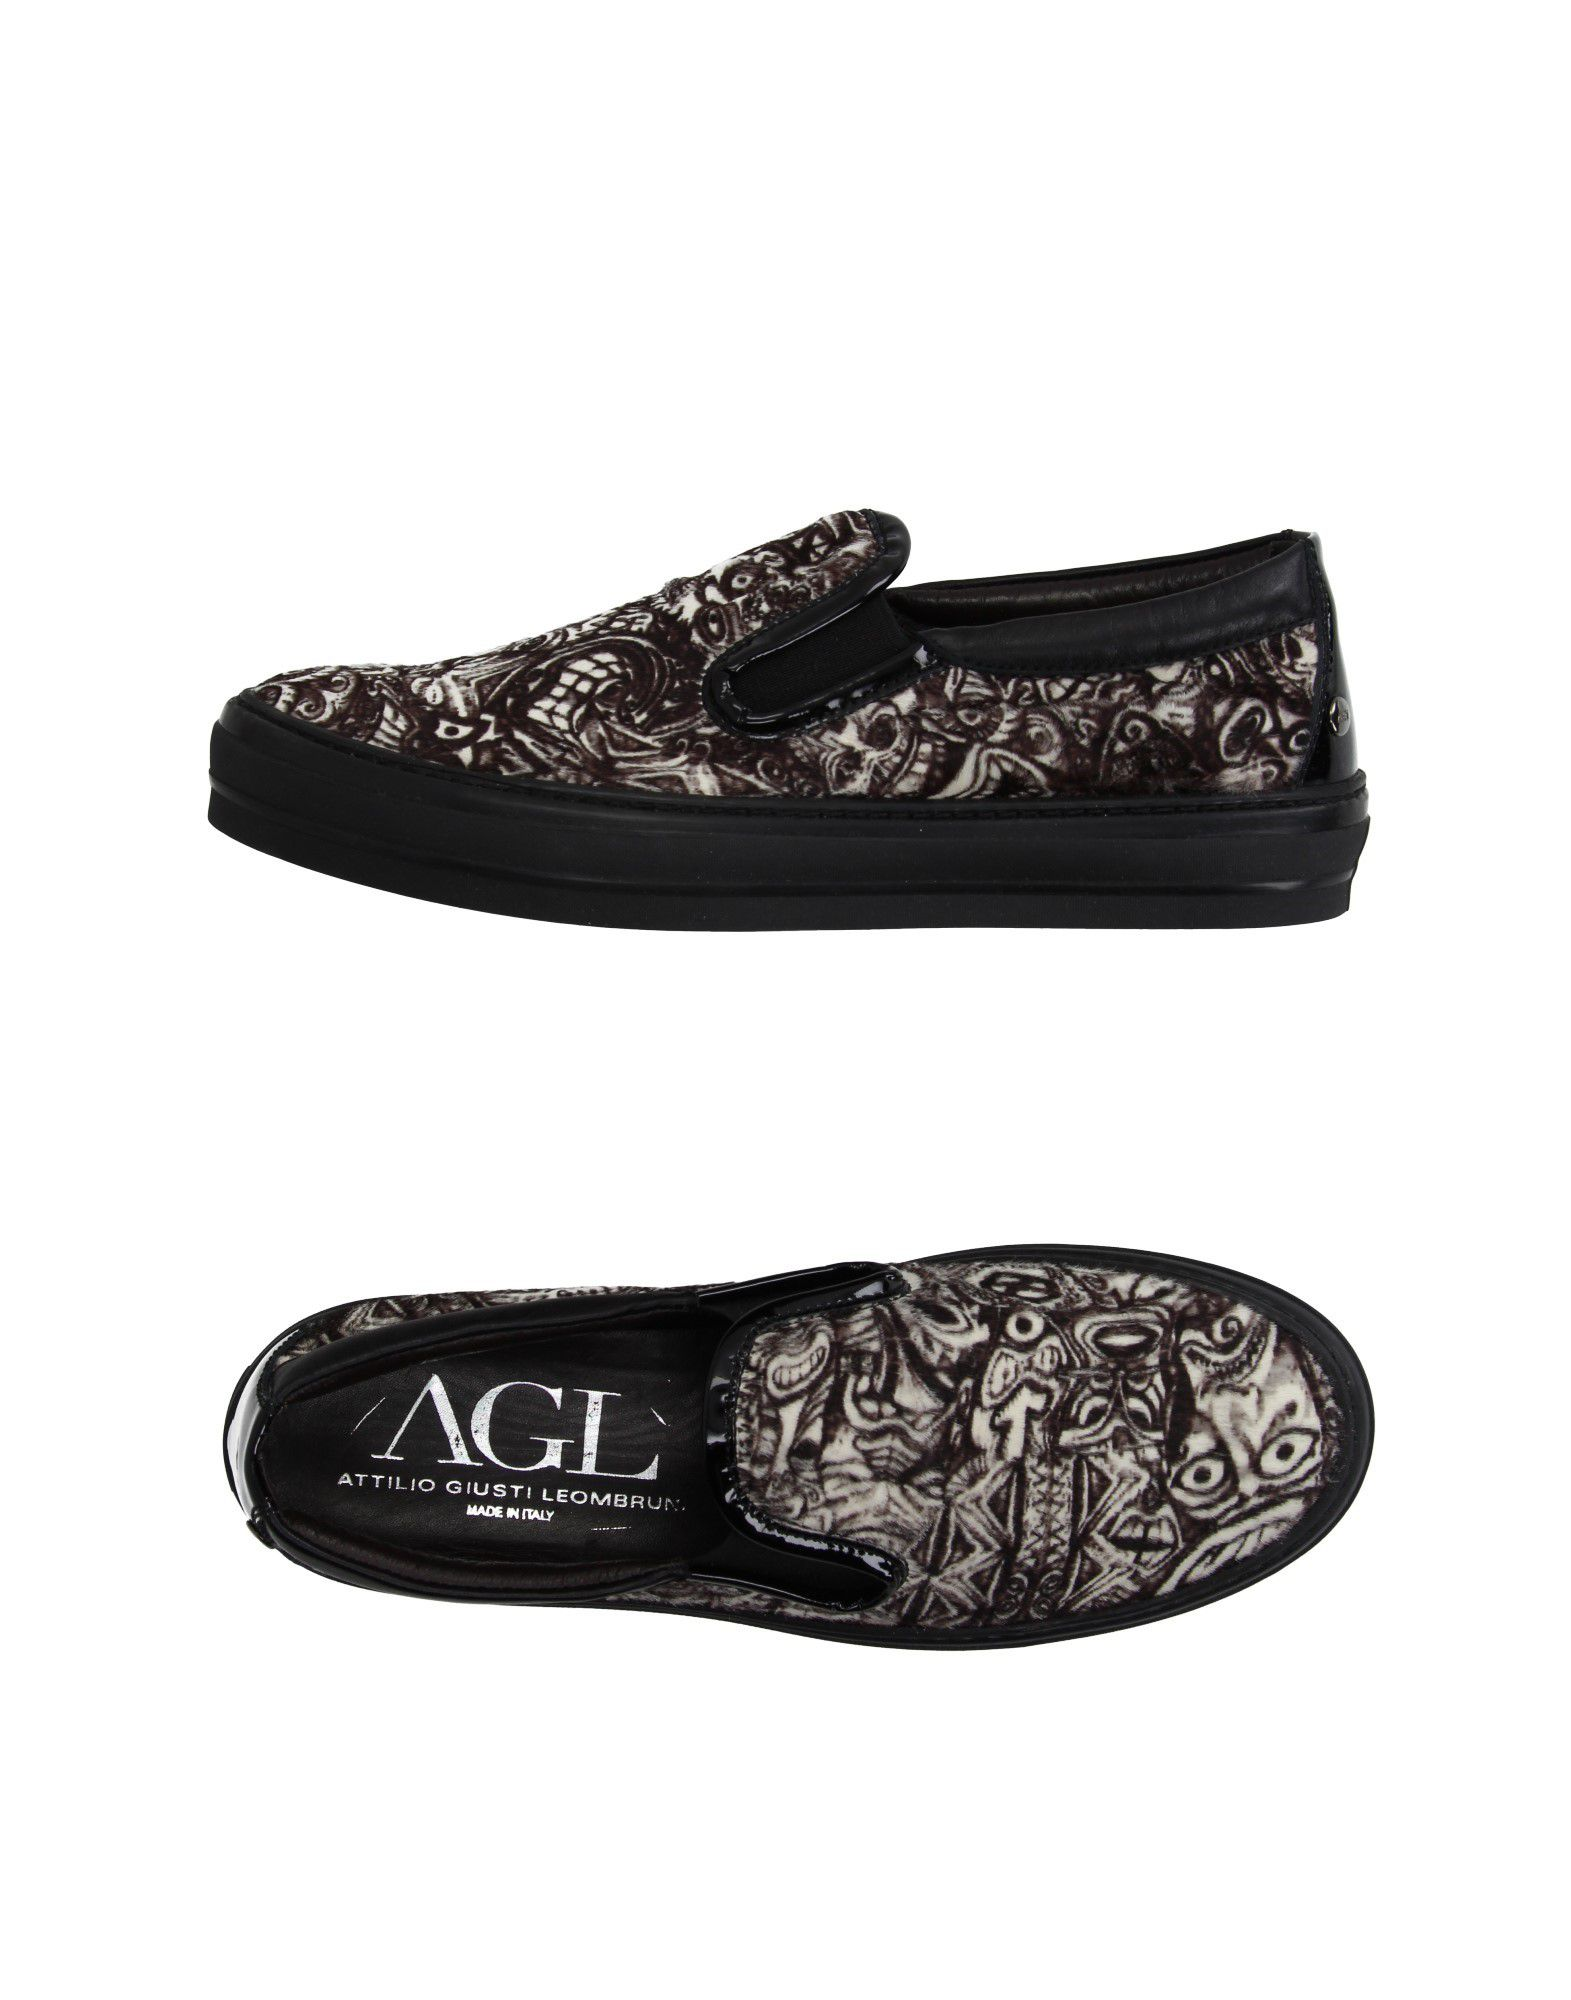 Sneakers Agl Attilio Giusti Leombruni Femme - Sneakers Agl Attilio Giusti Leombruni sur